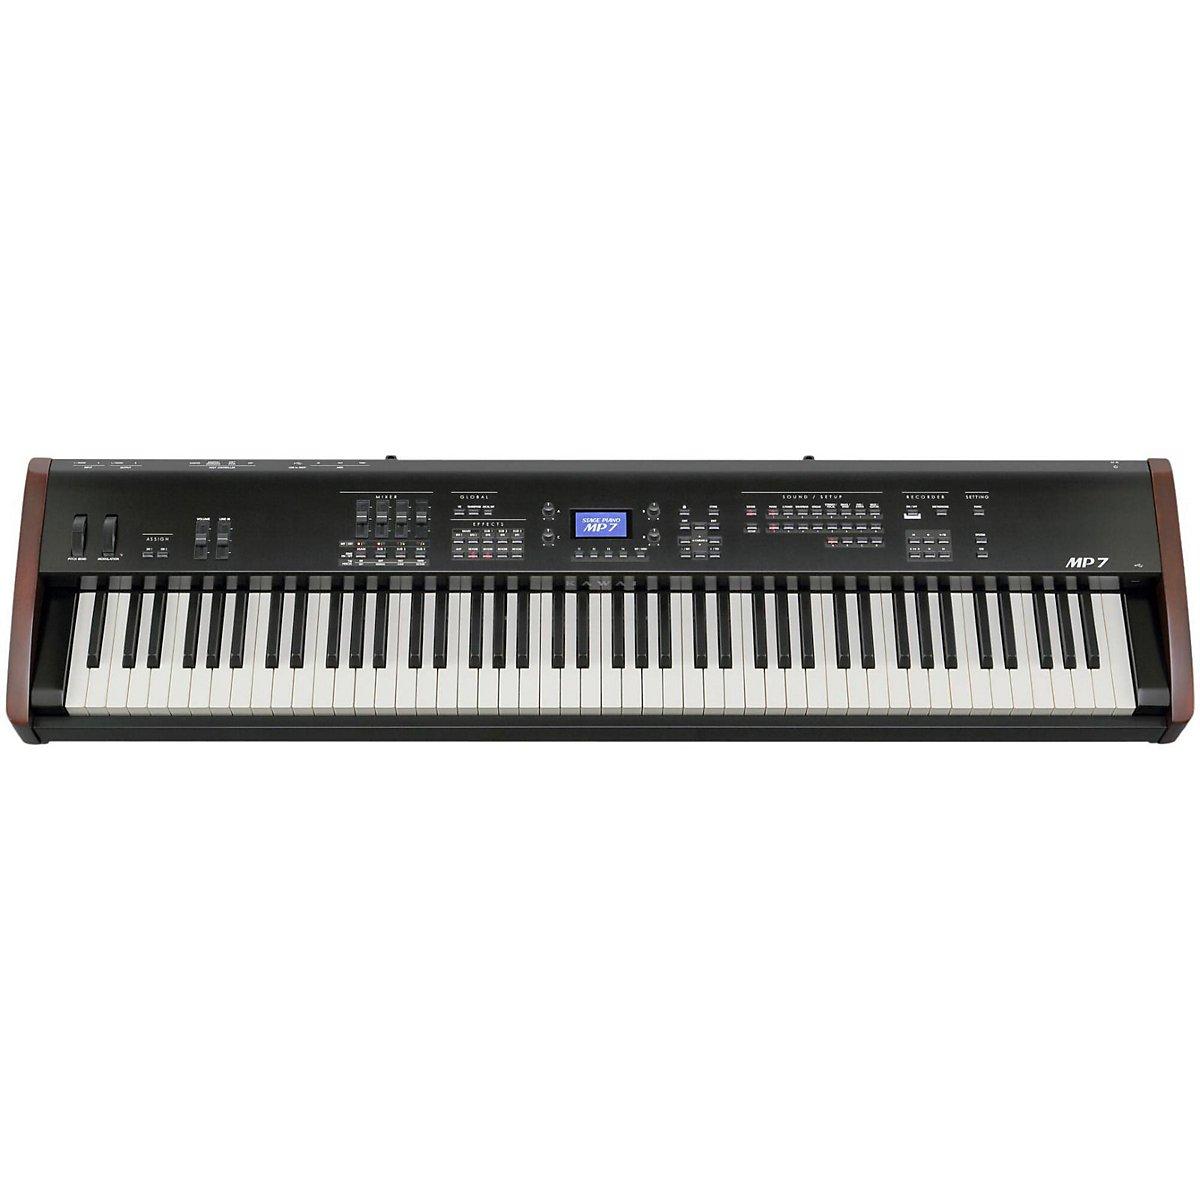 Piano Digitale Kawai Kawai Mp7 88-key Stage Piano